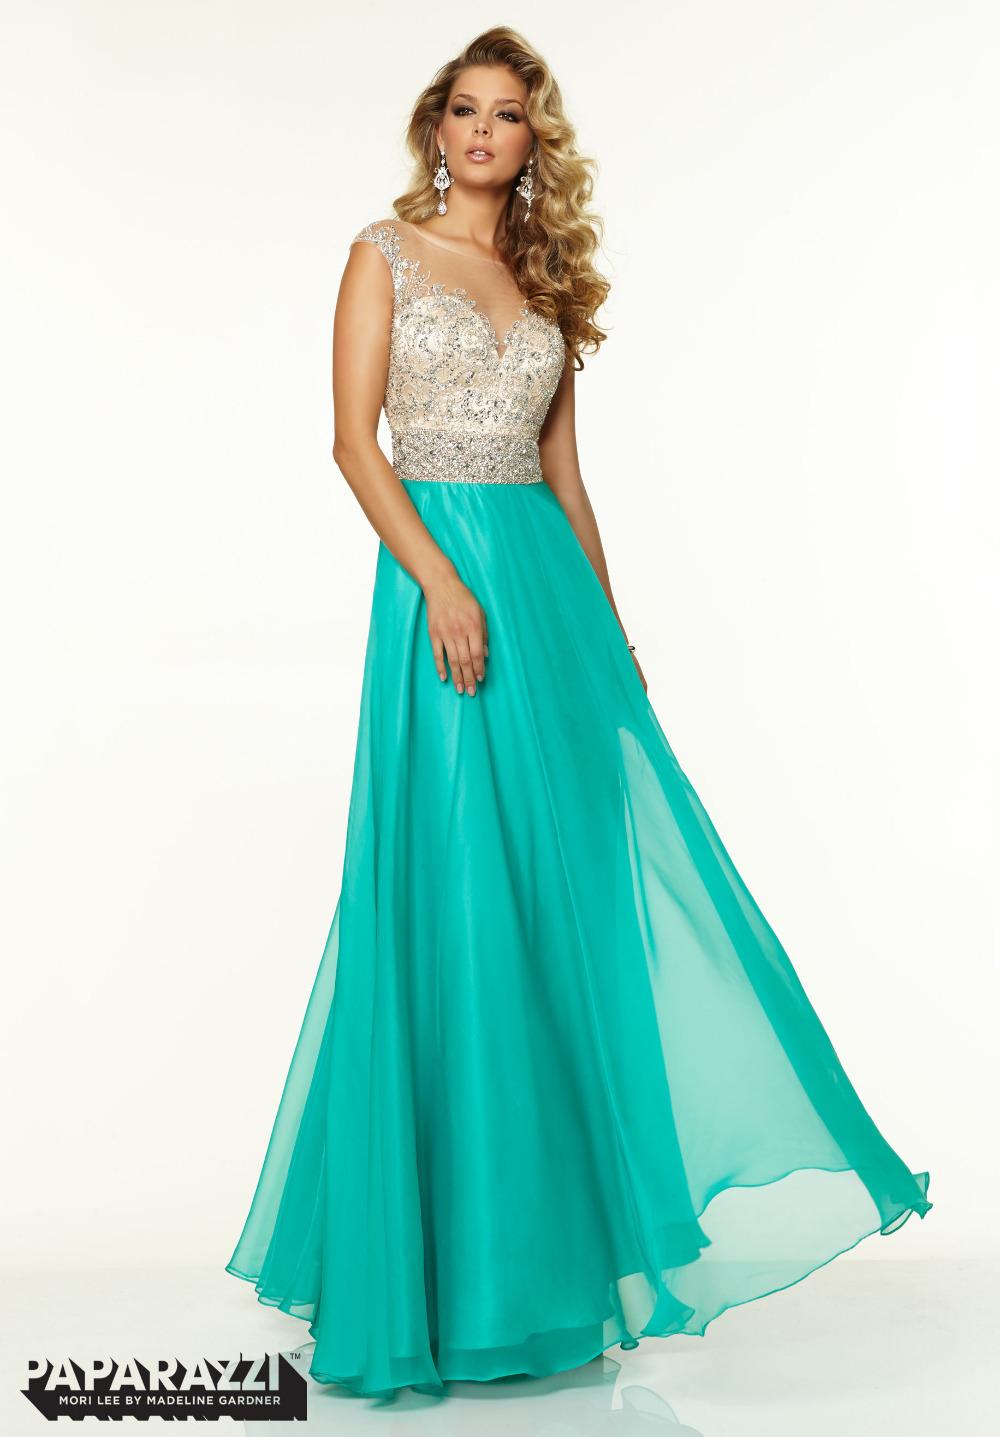 Old Fashioned Prom Dresses At Sears Elaboration - Wedding Dress ...